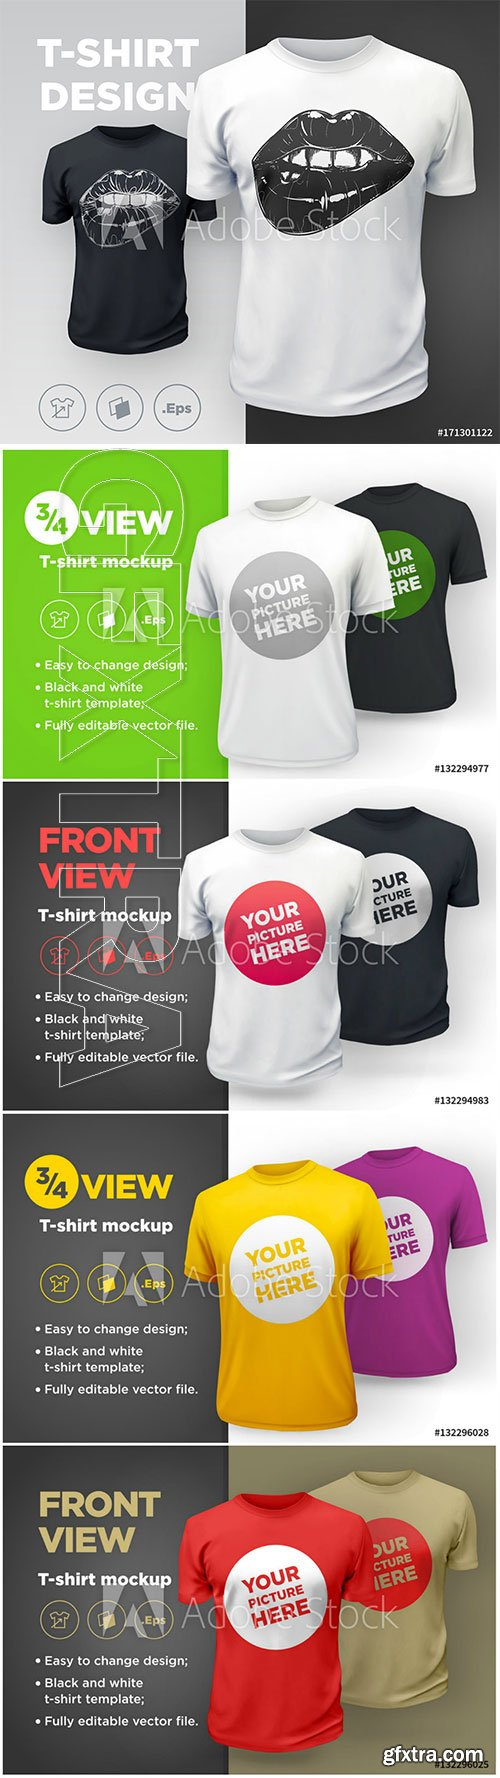 Men's t-shirt with short sleeve mockup vector illustration